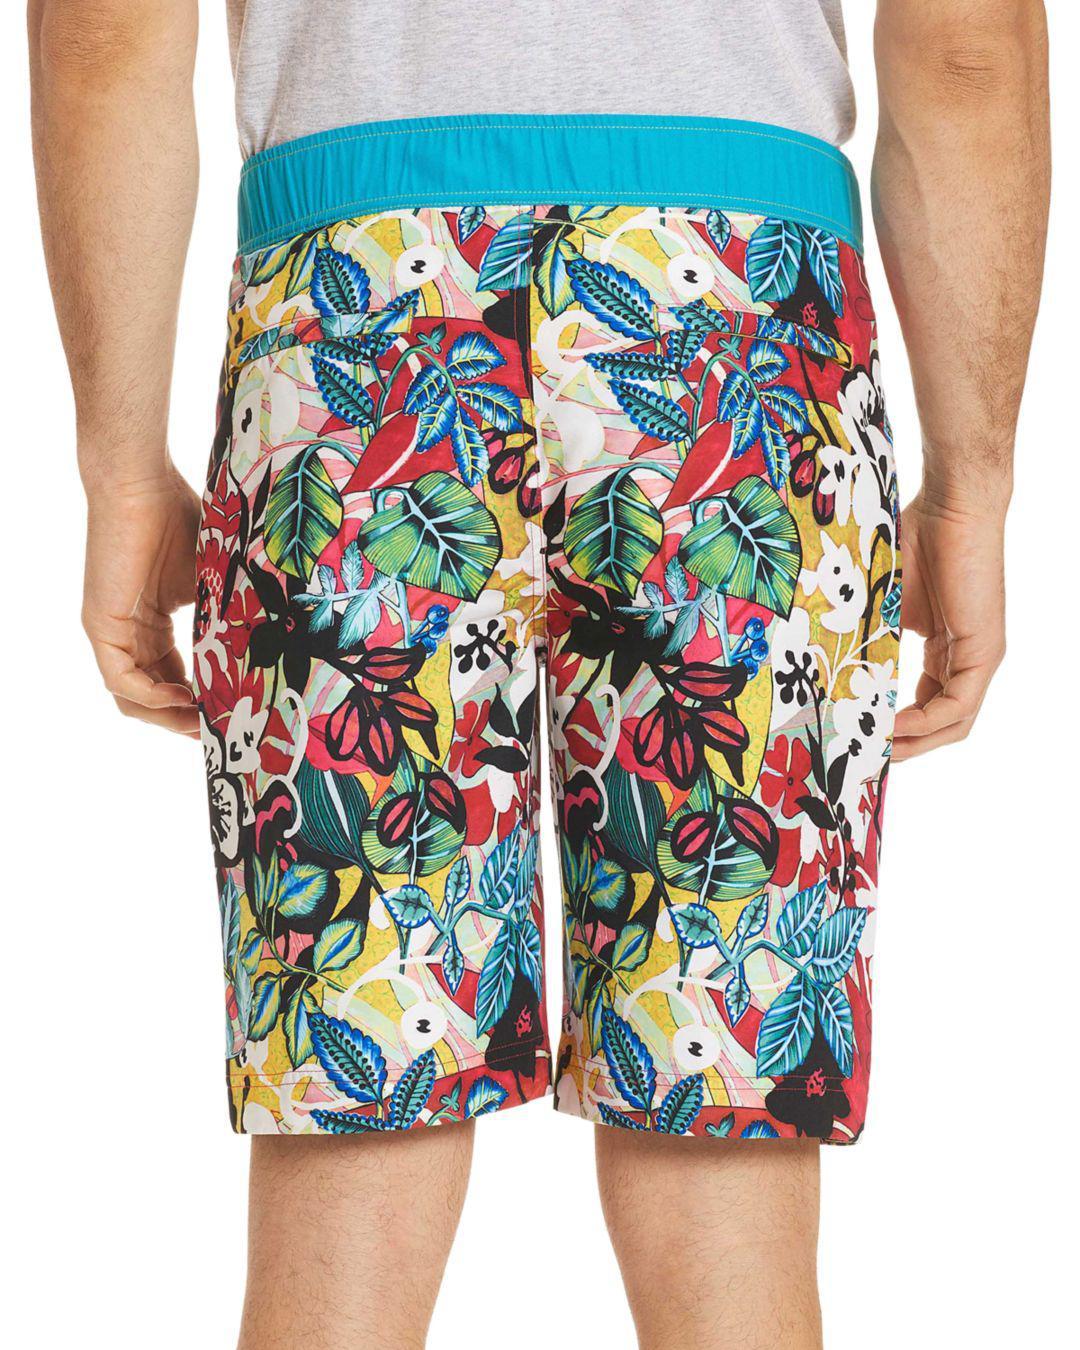 e9bb064a3a Robert Graham - Blue Barbarito Floral Board Shorts for Men - Lyst. View  fullscreen